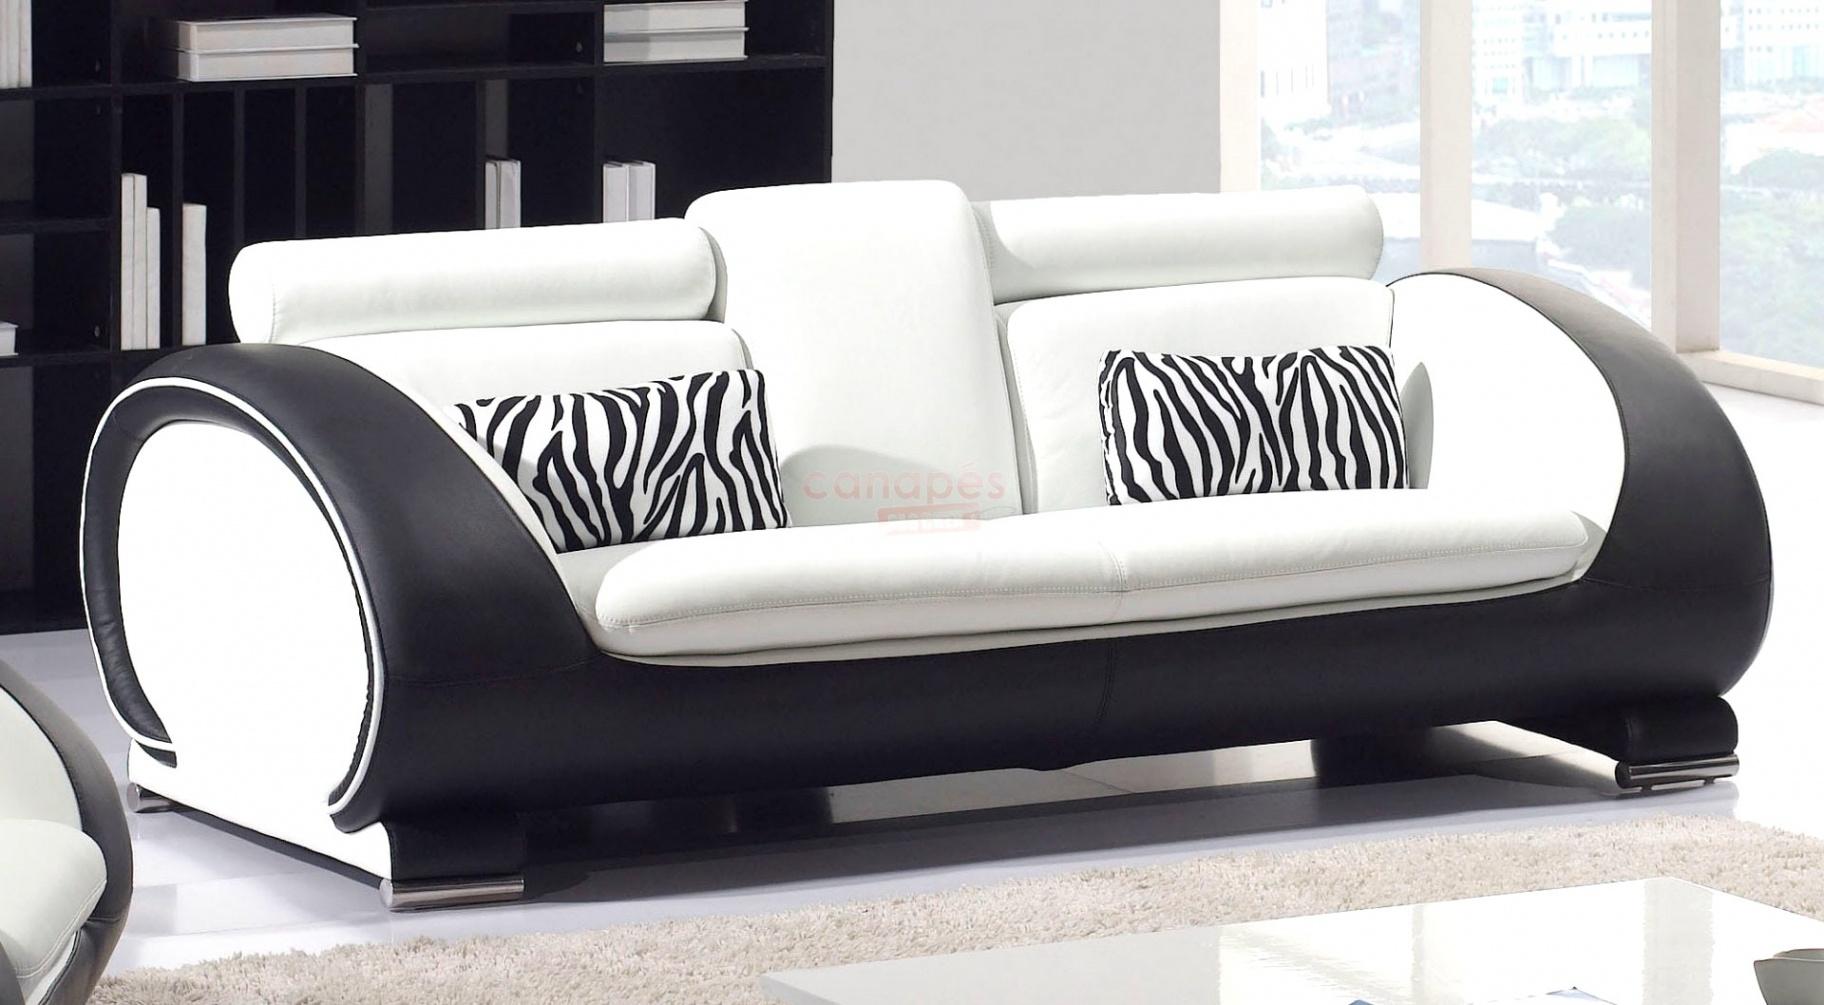 Canapé D Angle Ikea Convertible Inspirant Stock Canapé 3 Places Cuir — Laguerredesmots